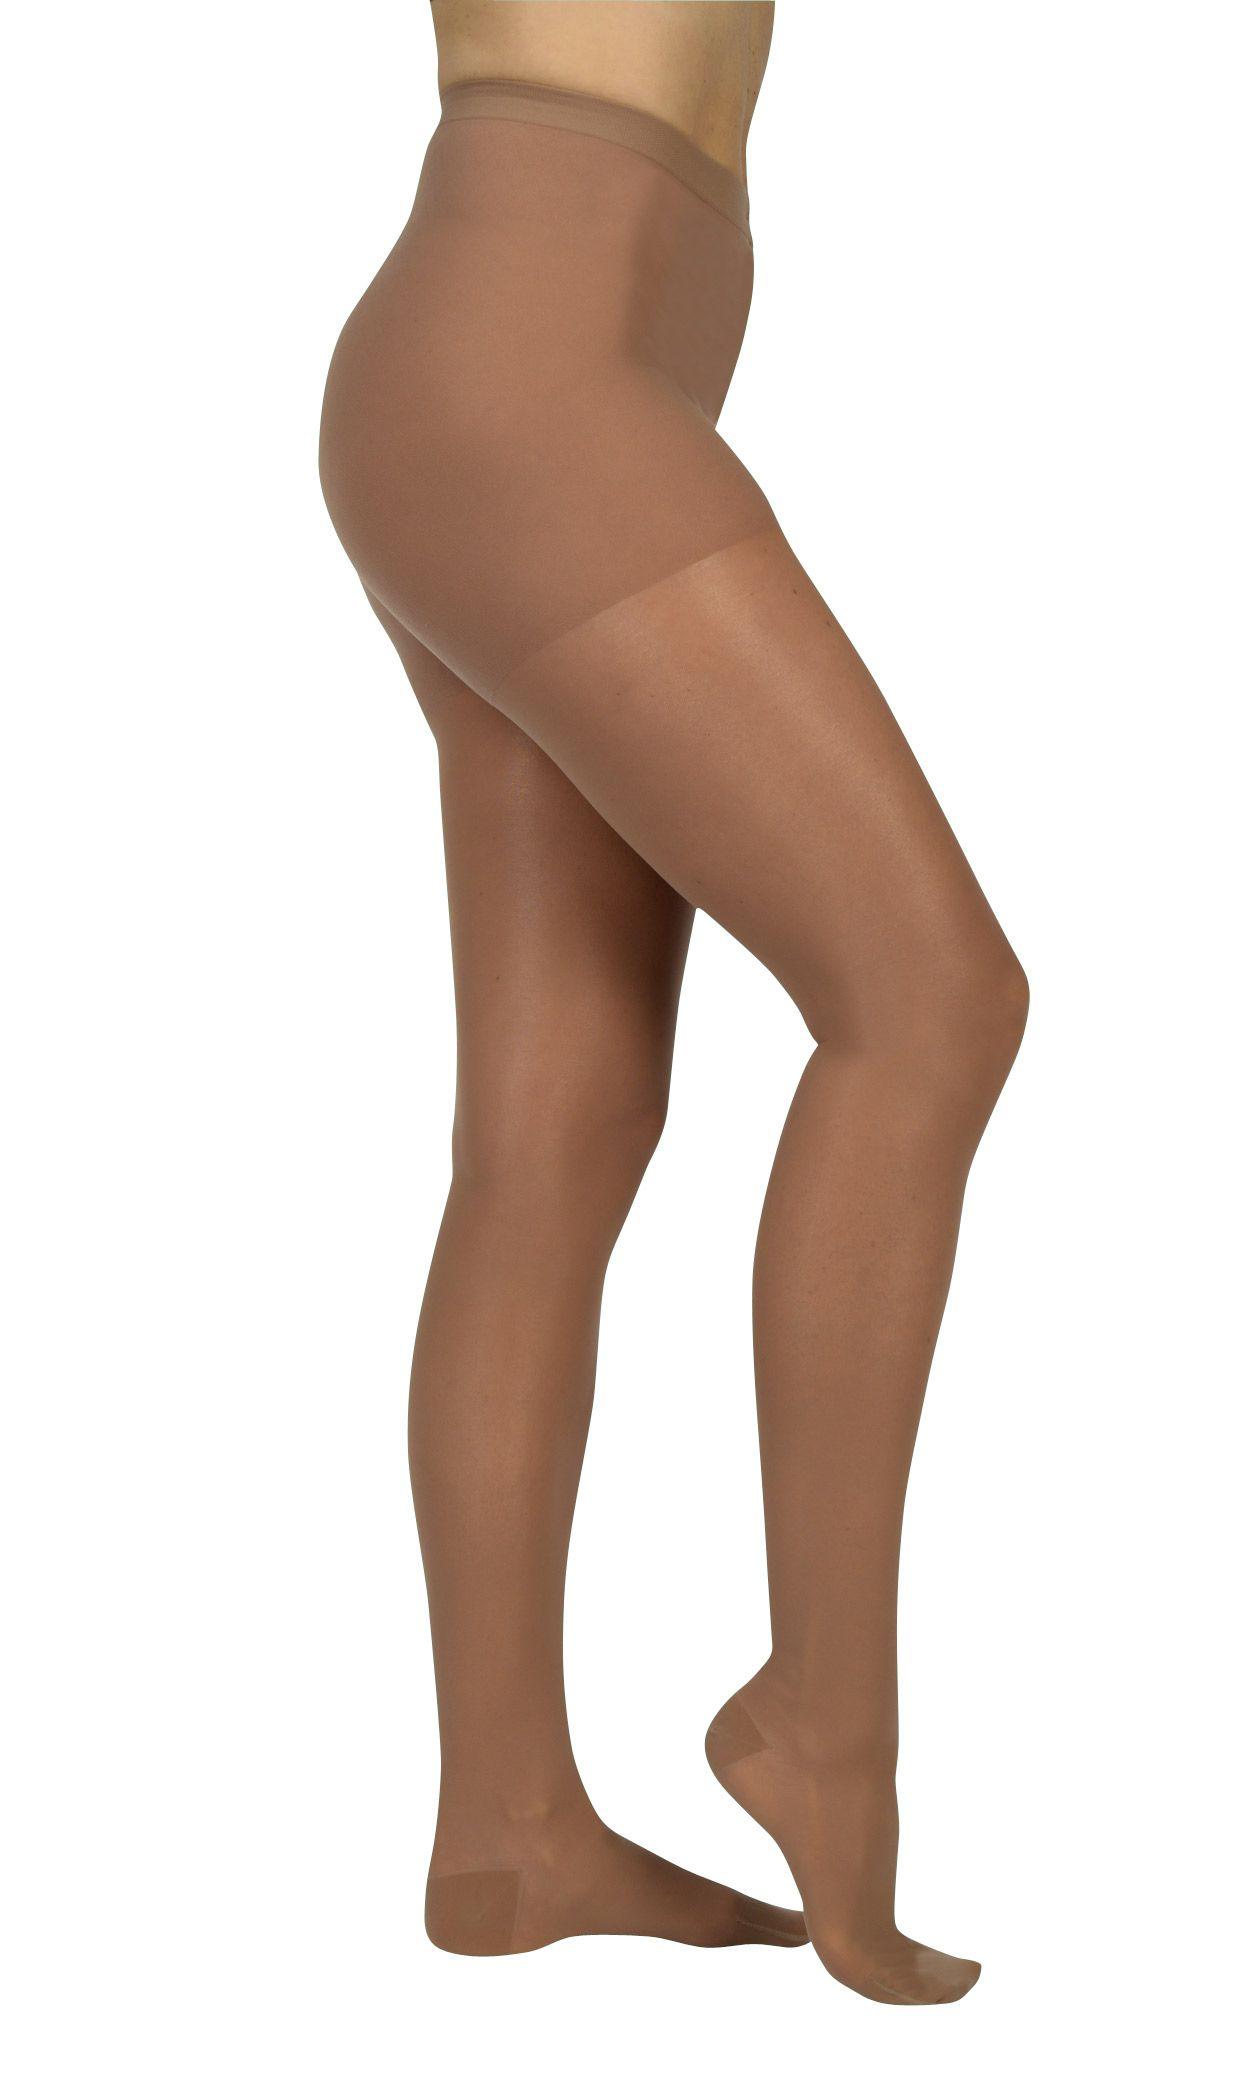 pantyhose Notch toes